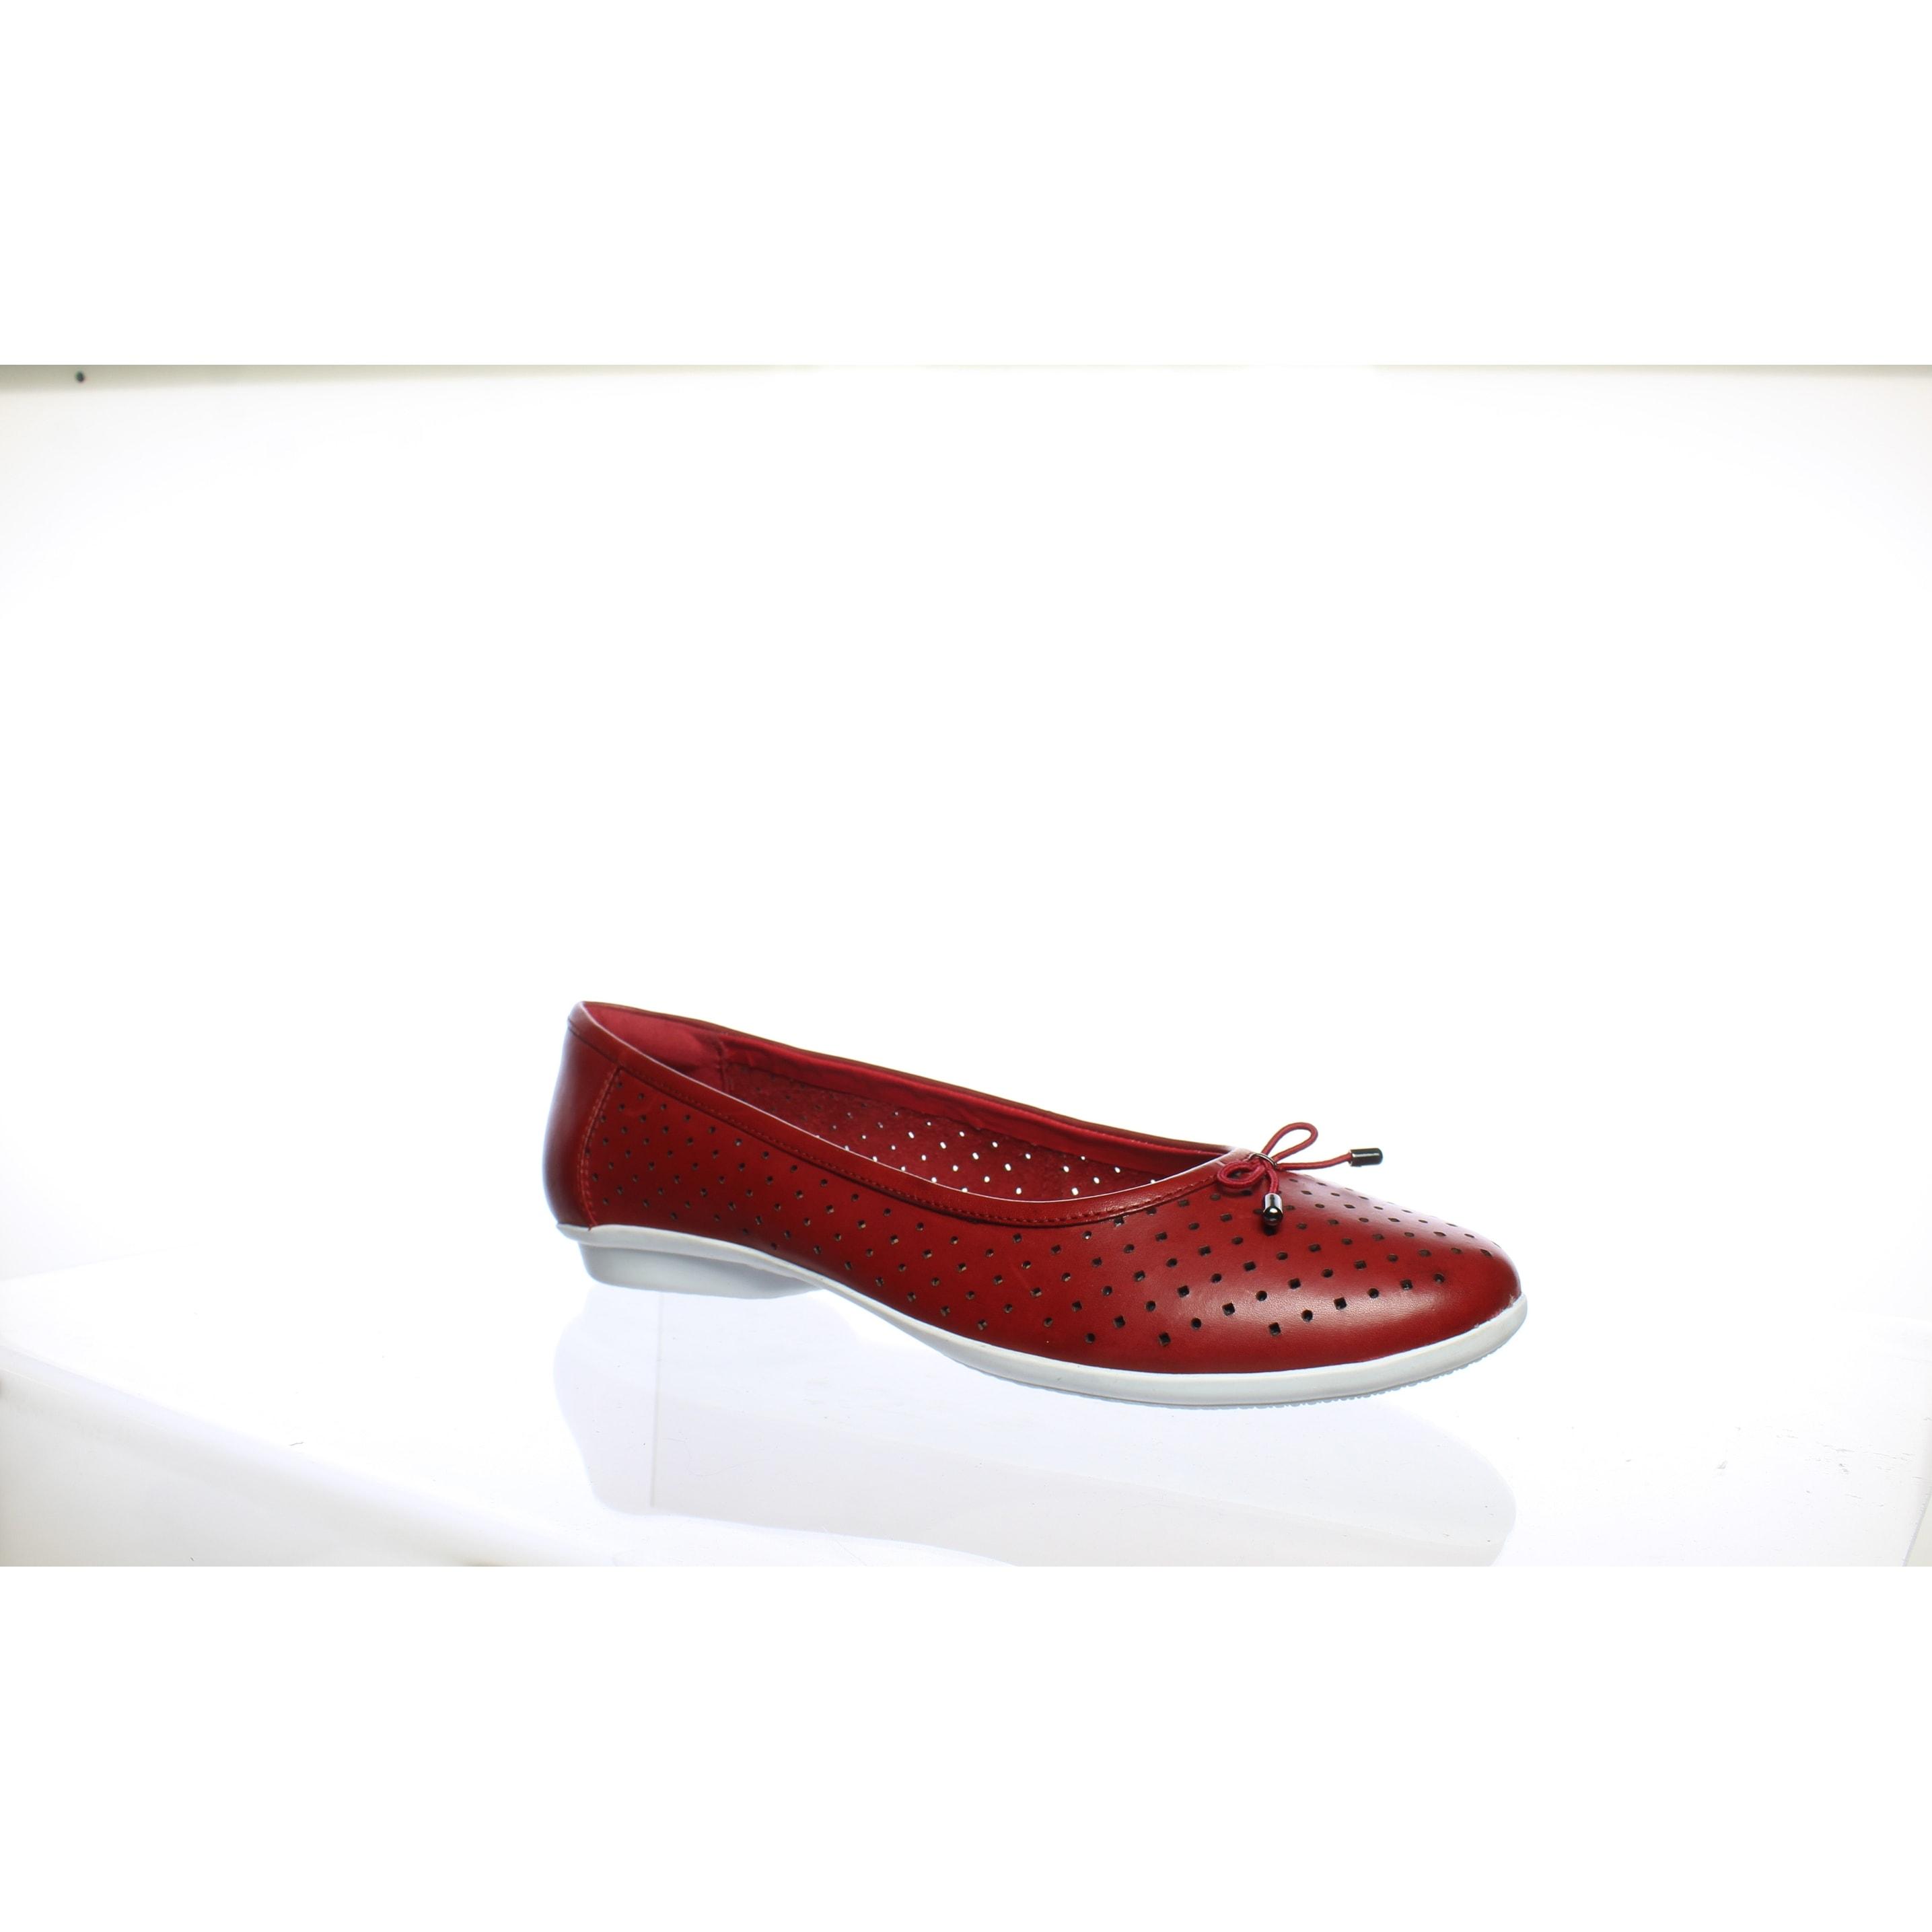 b074790c848 Shop Clarks Womens Gracelin Lea Red Leather Ballet Flats Size 11 ...